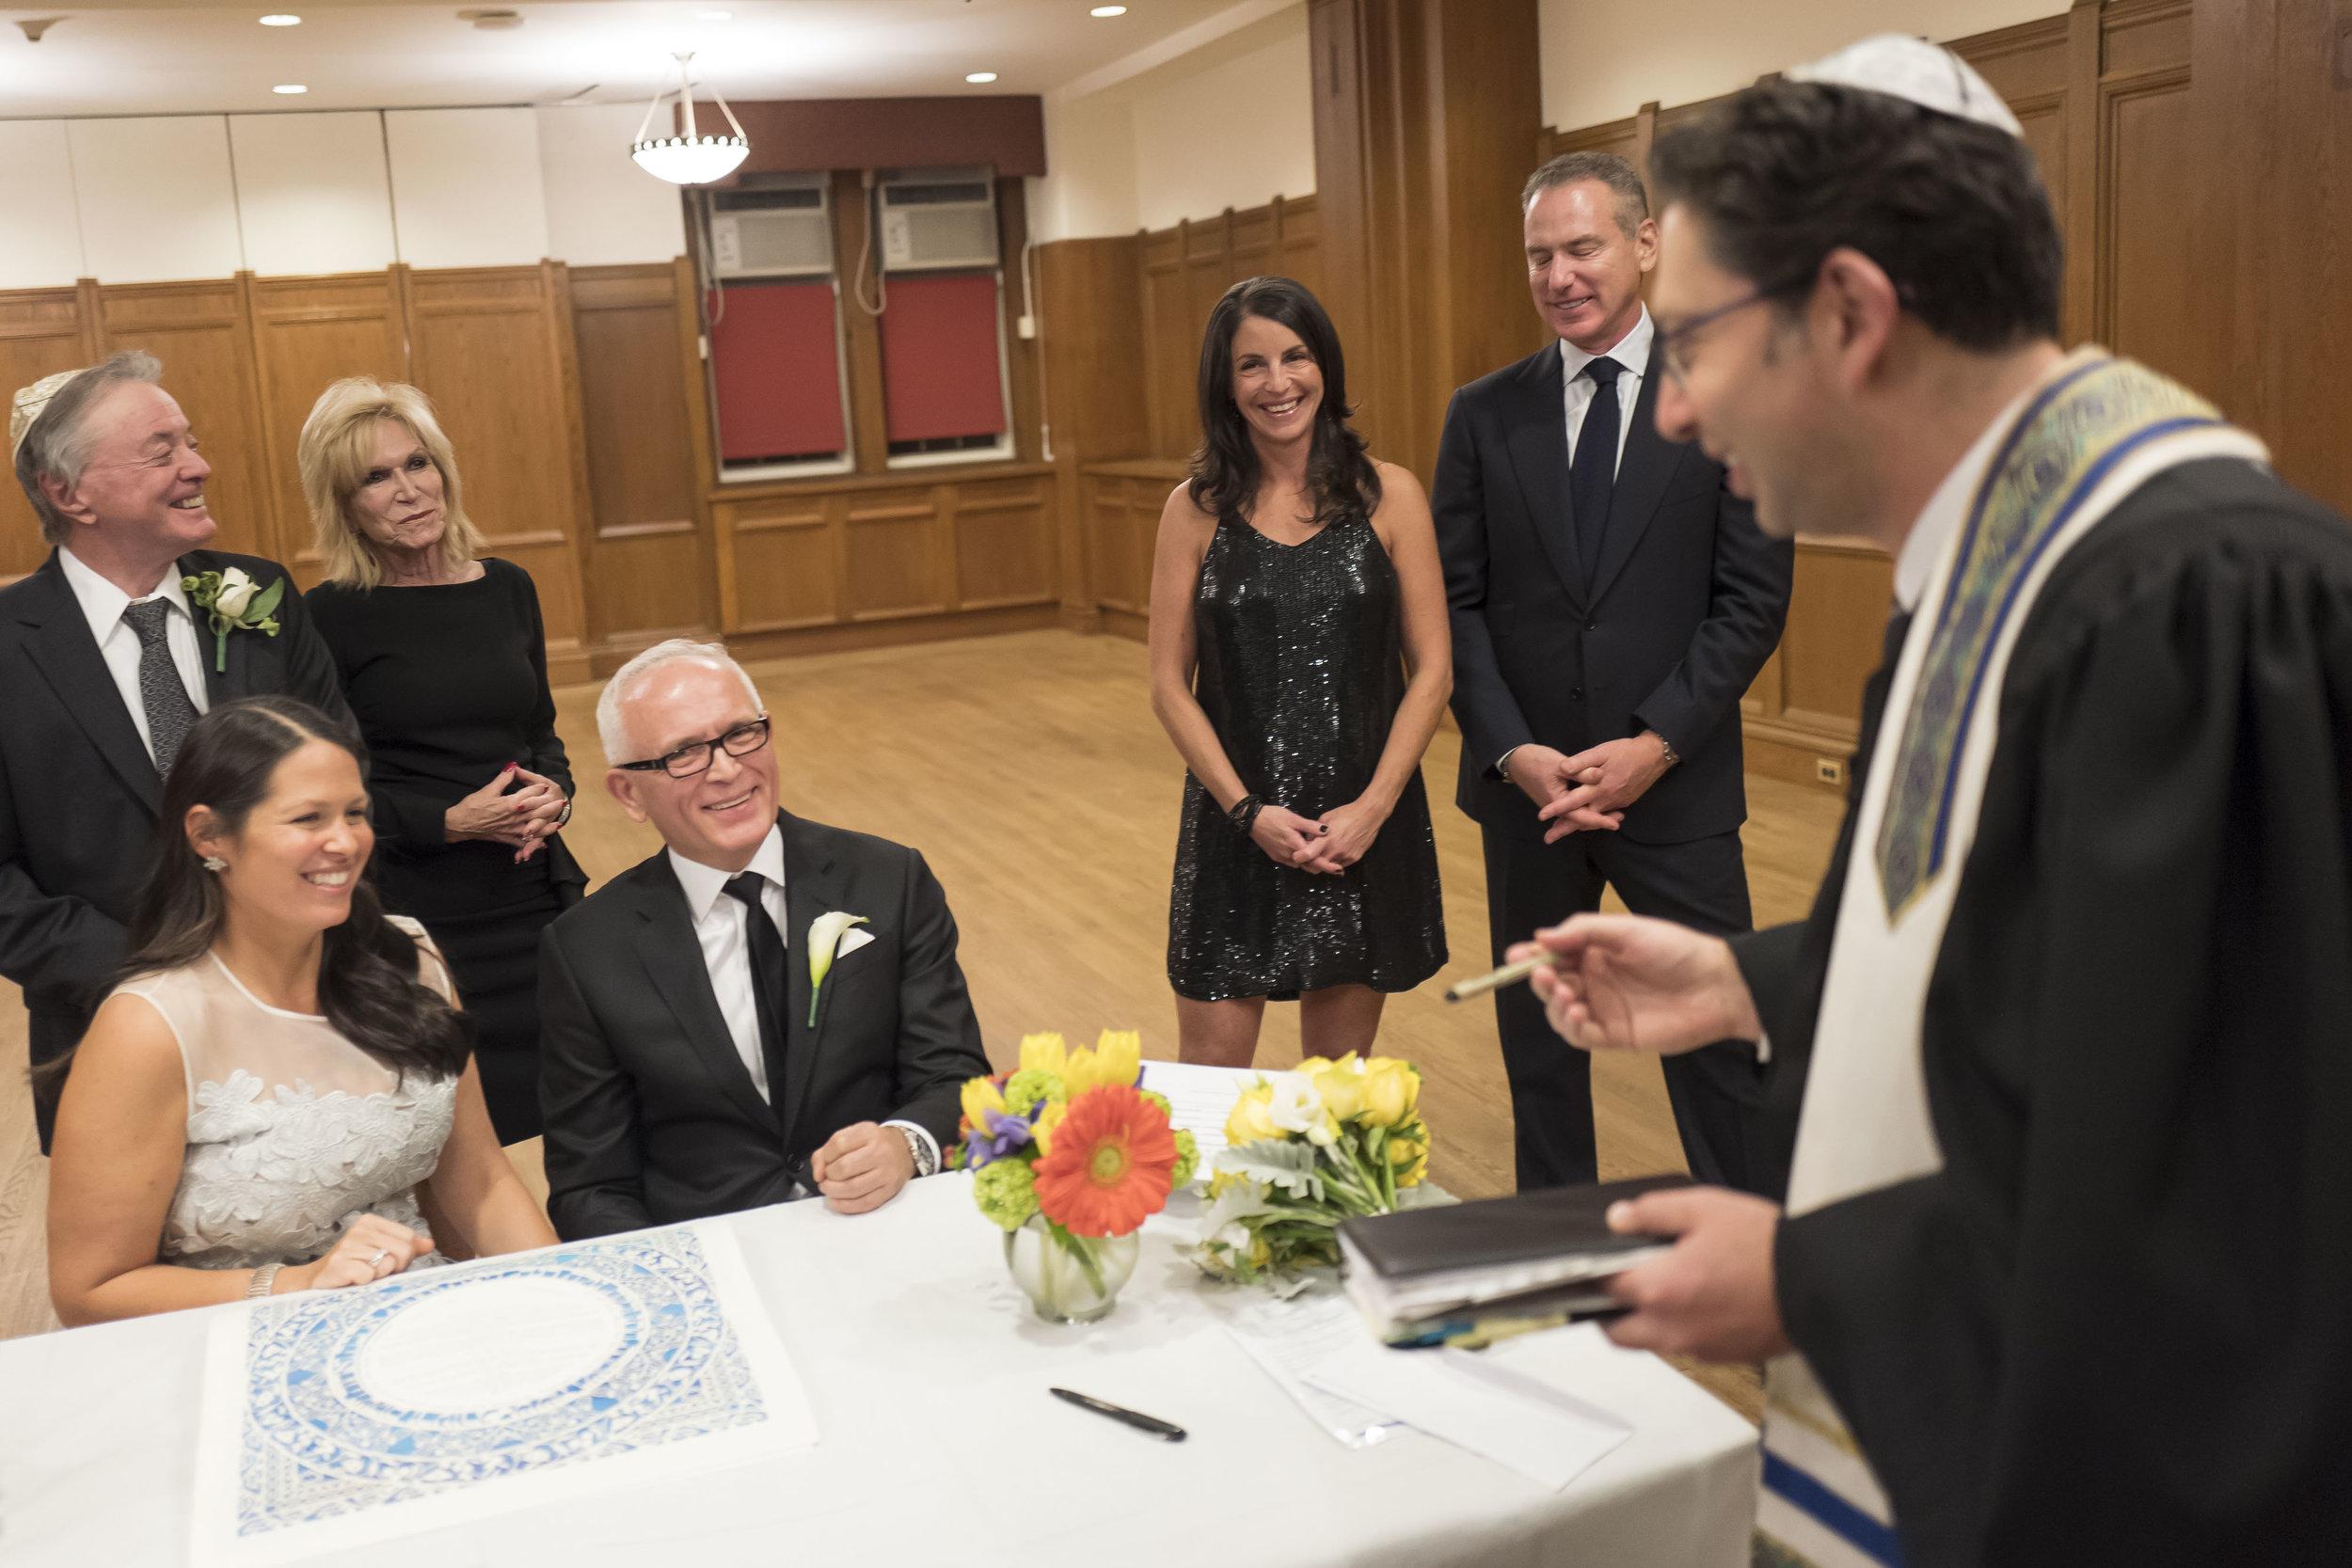 synagogue-wedding-photographer-1224.JPG